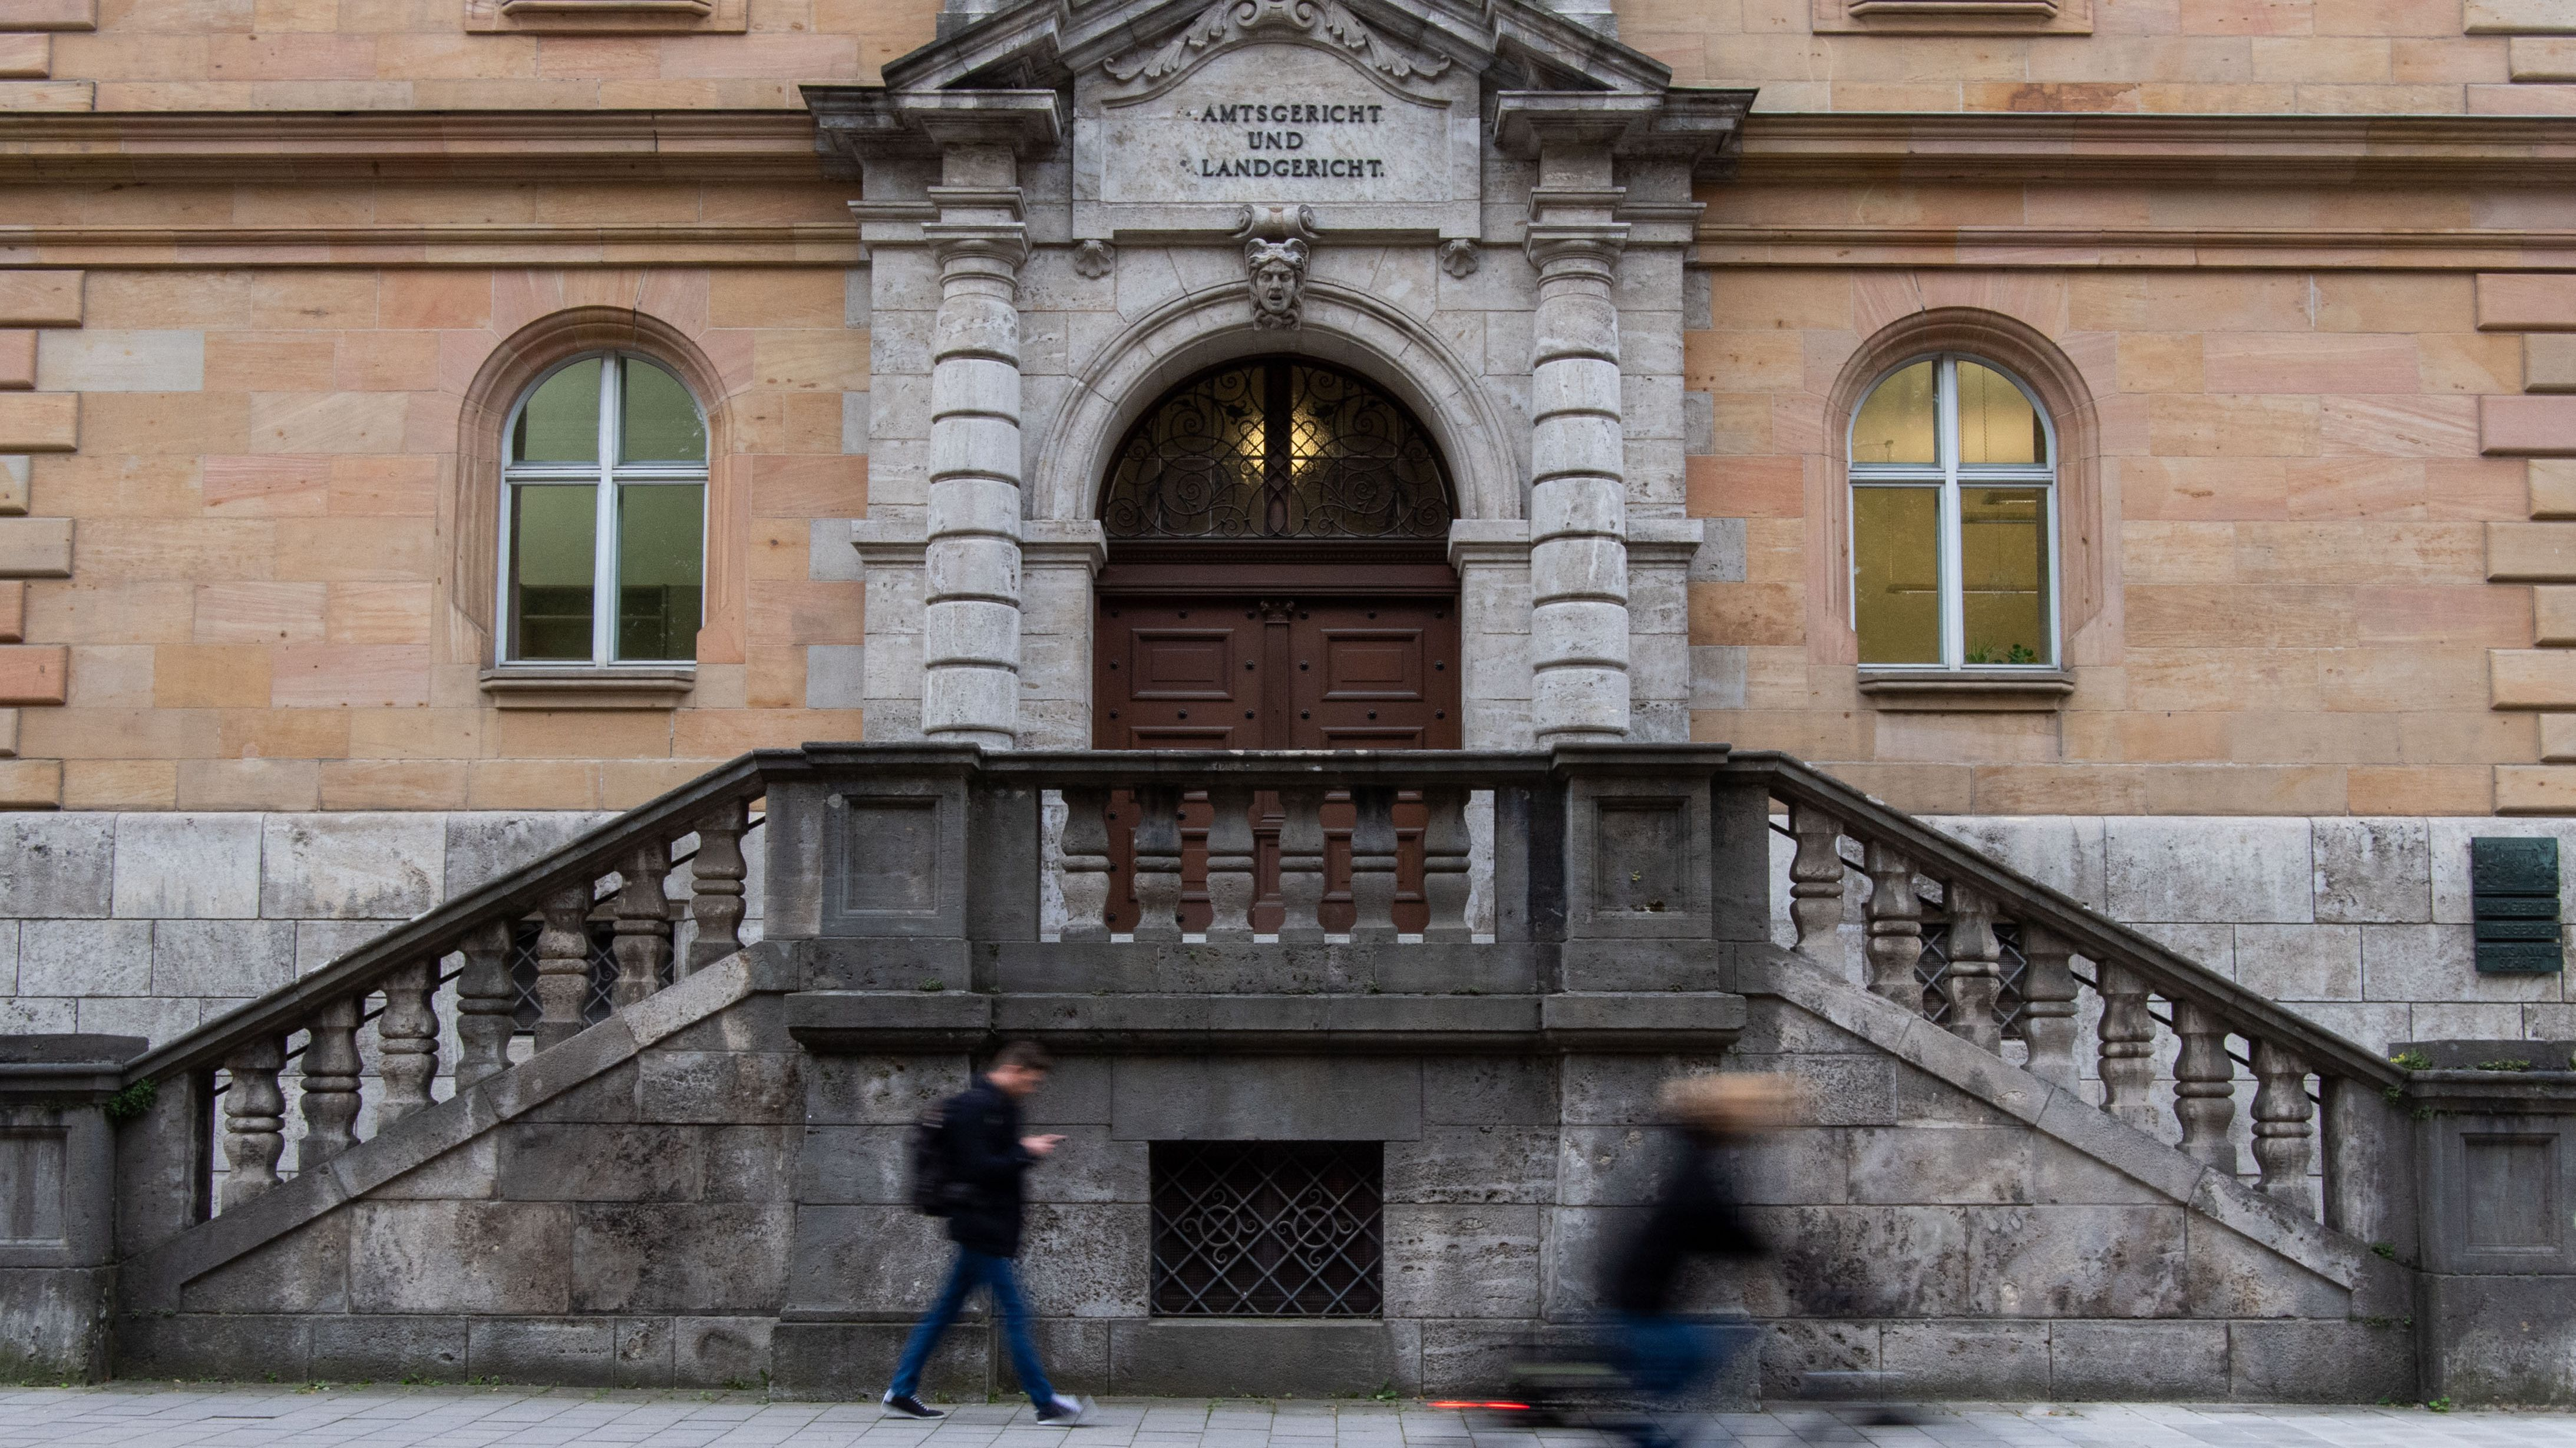 Das Portal des Regensburger Landgerichts